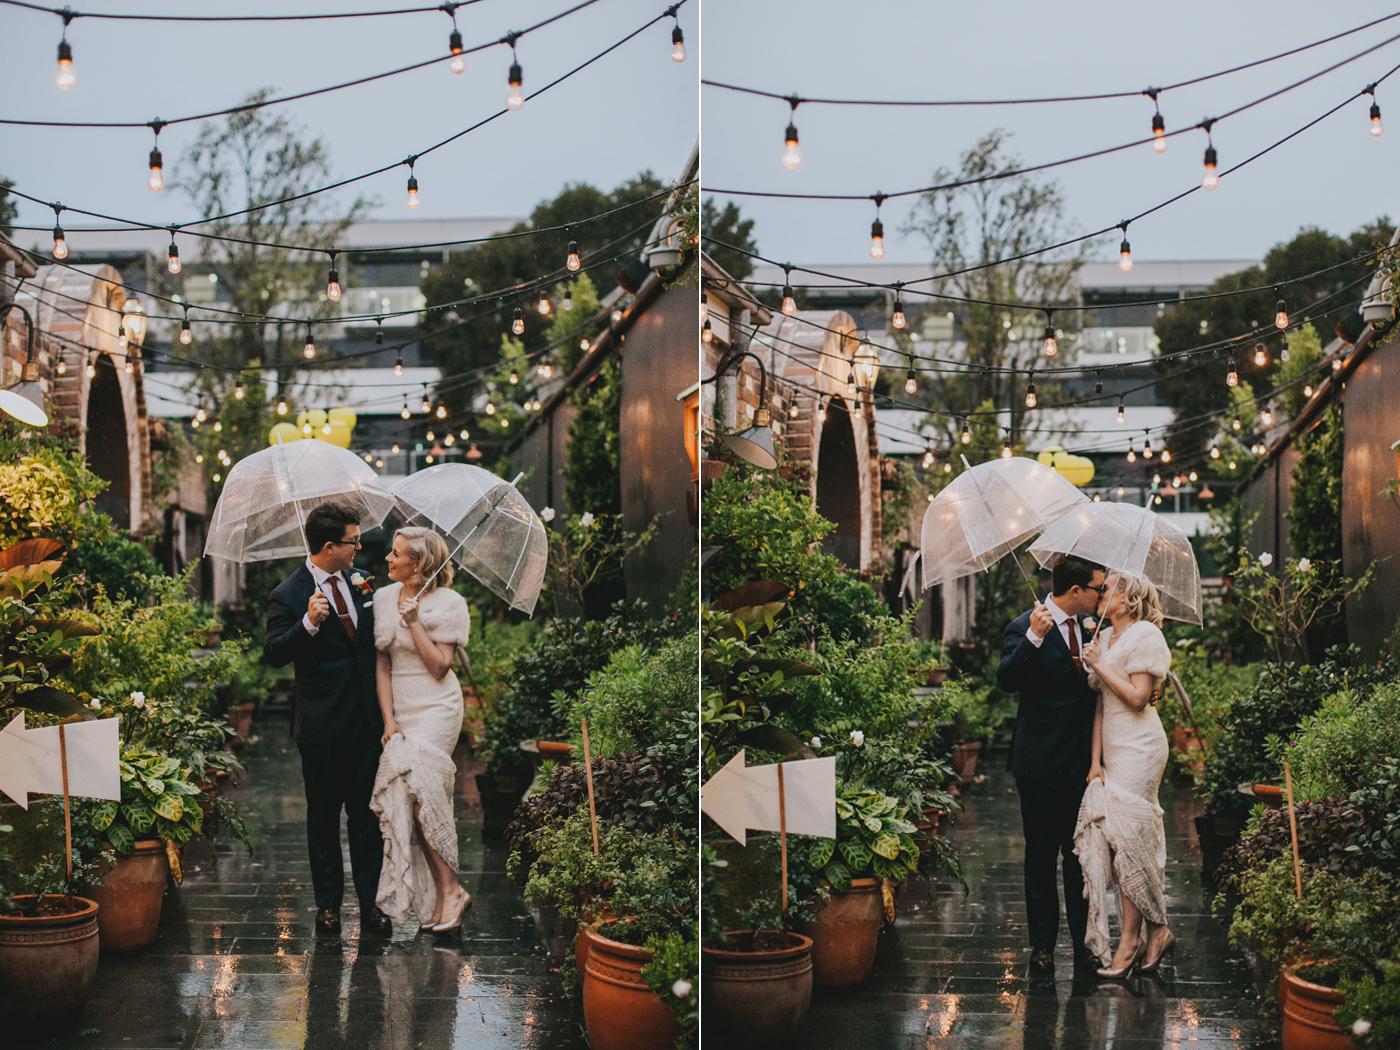 Jo & Tom Wedding - The Grounds of Alexandria - Samantha Heather Photography-250.jpg